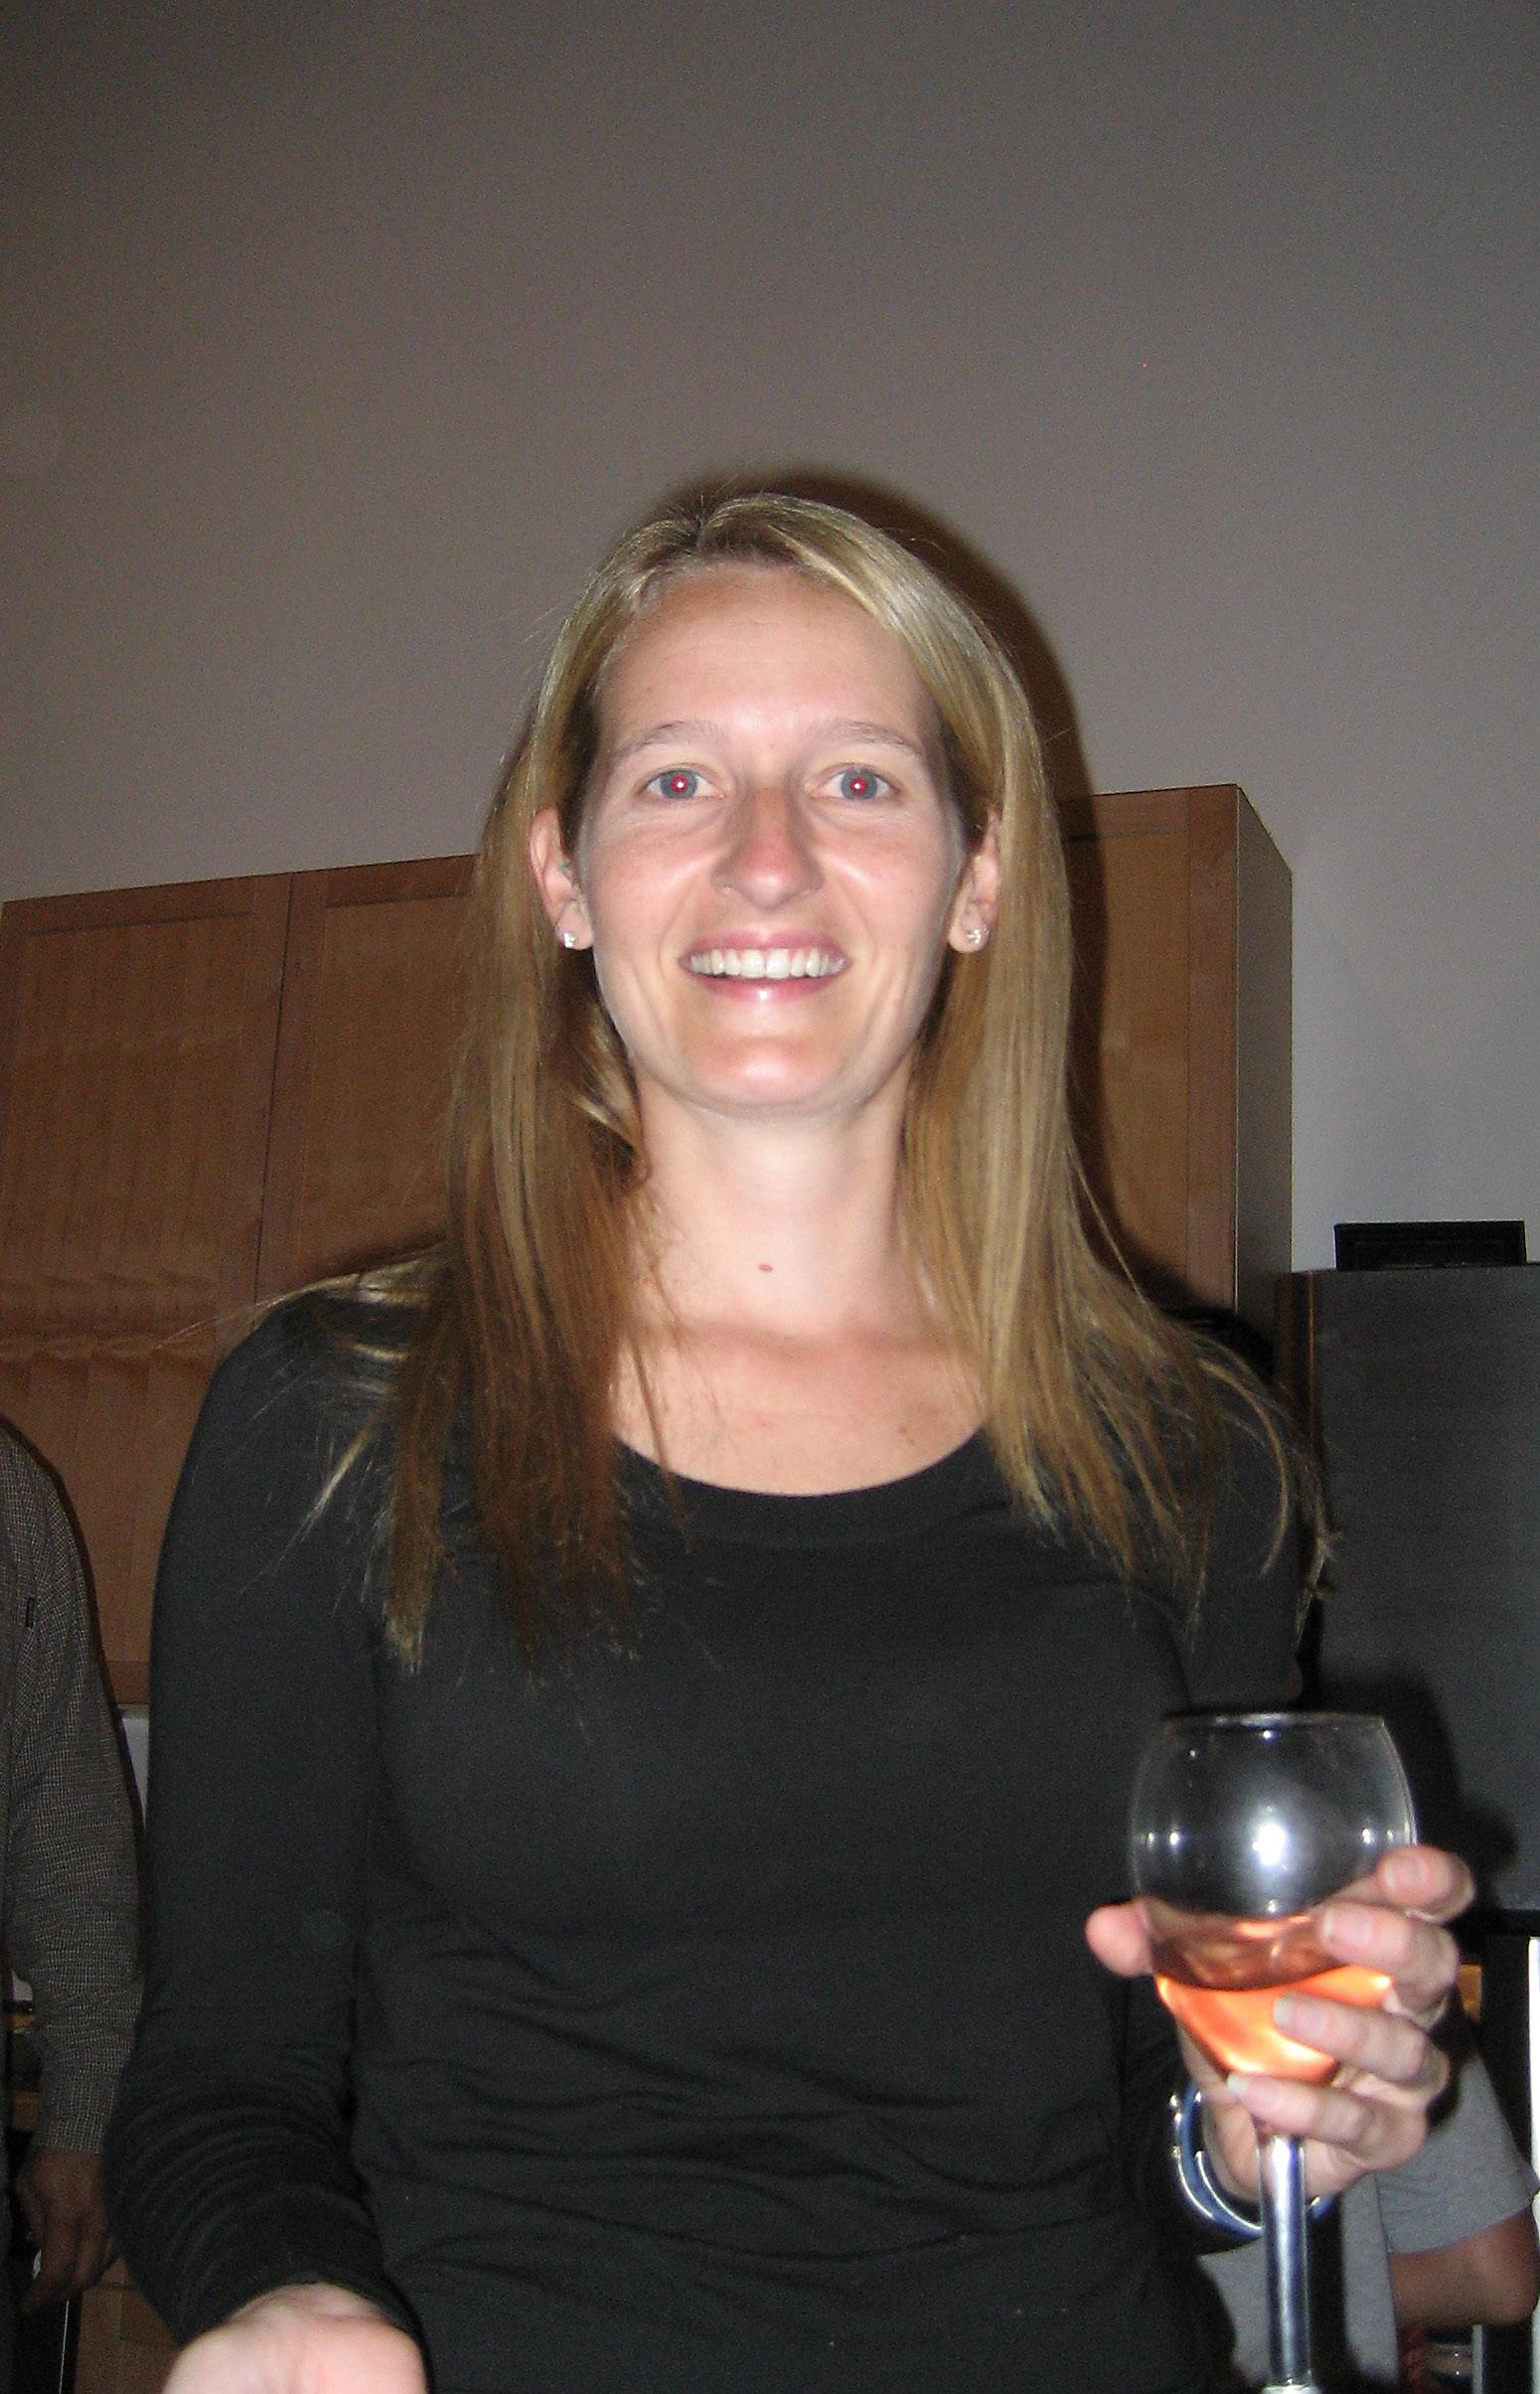 Rachel McCabe